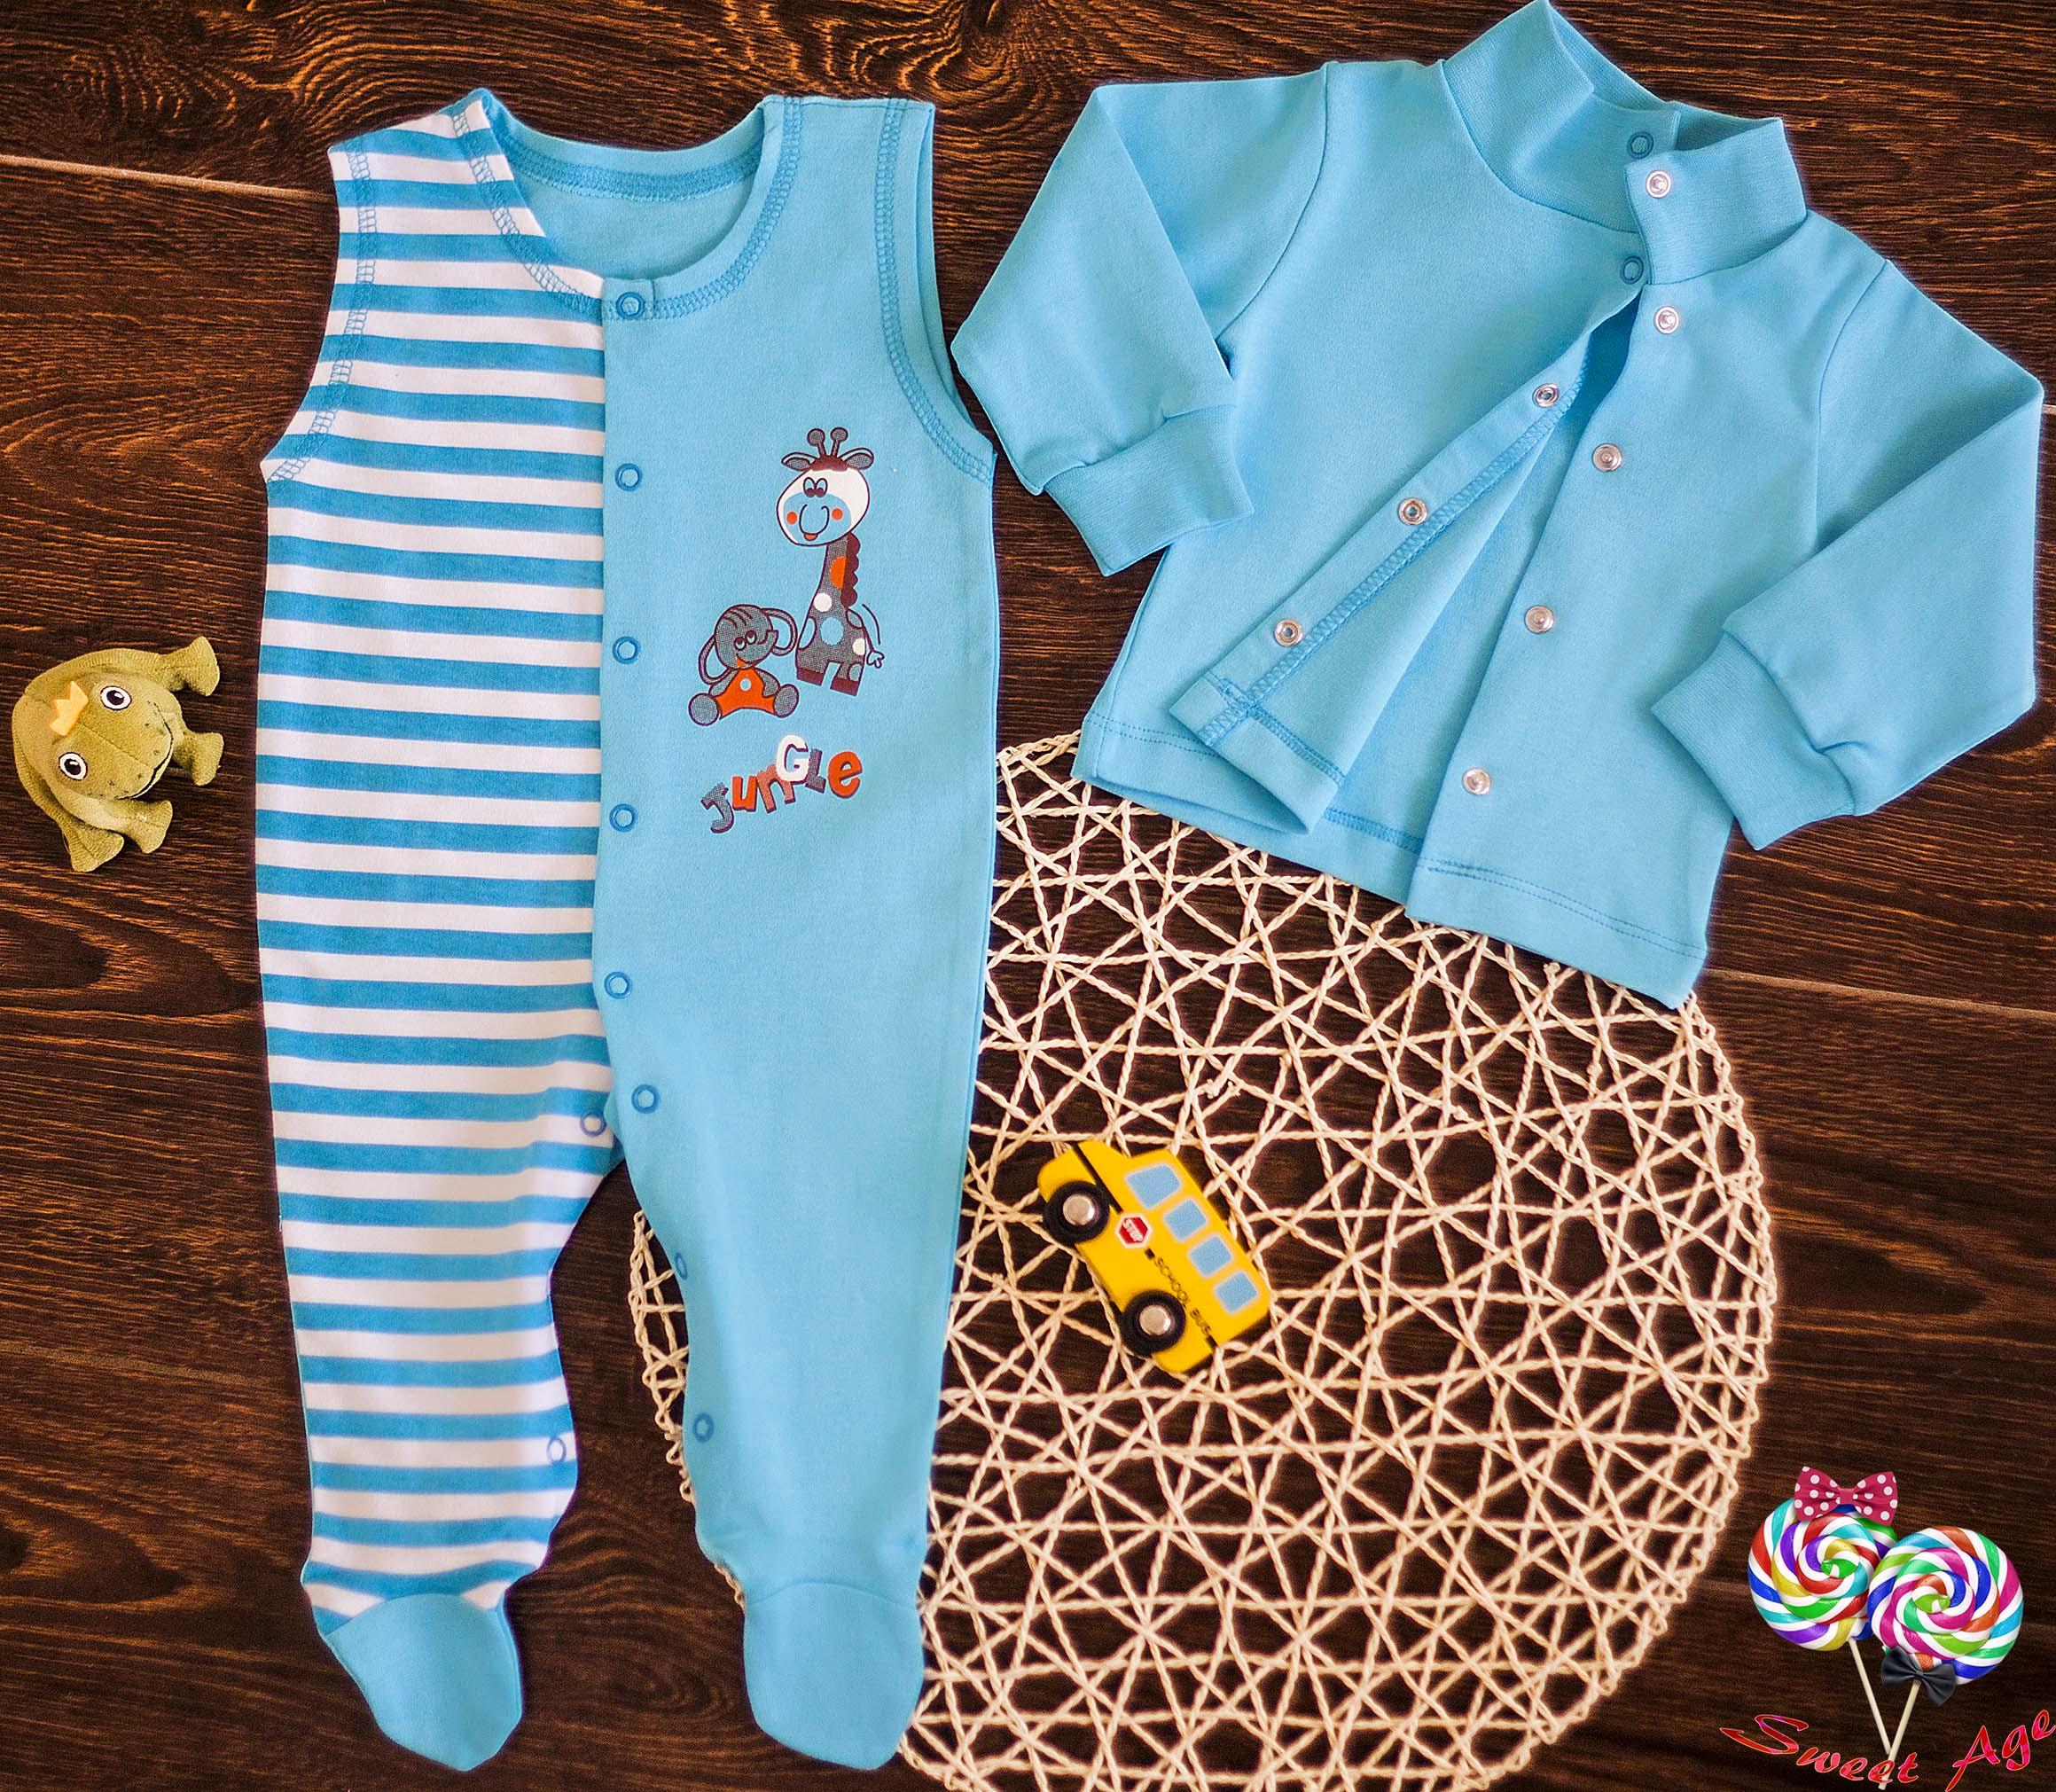 ПИАР! Яркая одежда для детей (от 56 до 128 см) по низким ценам (от 140 до 700 руб)